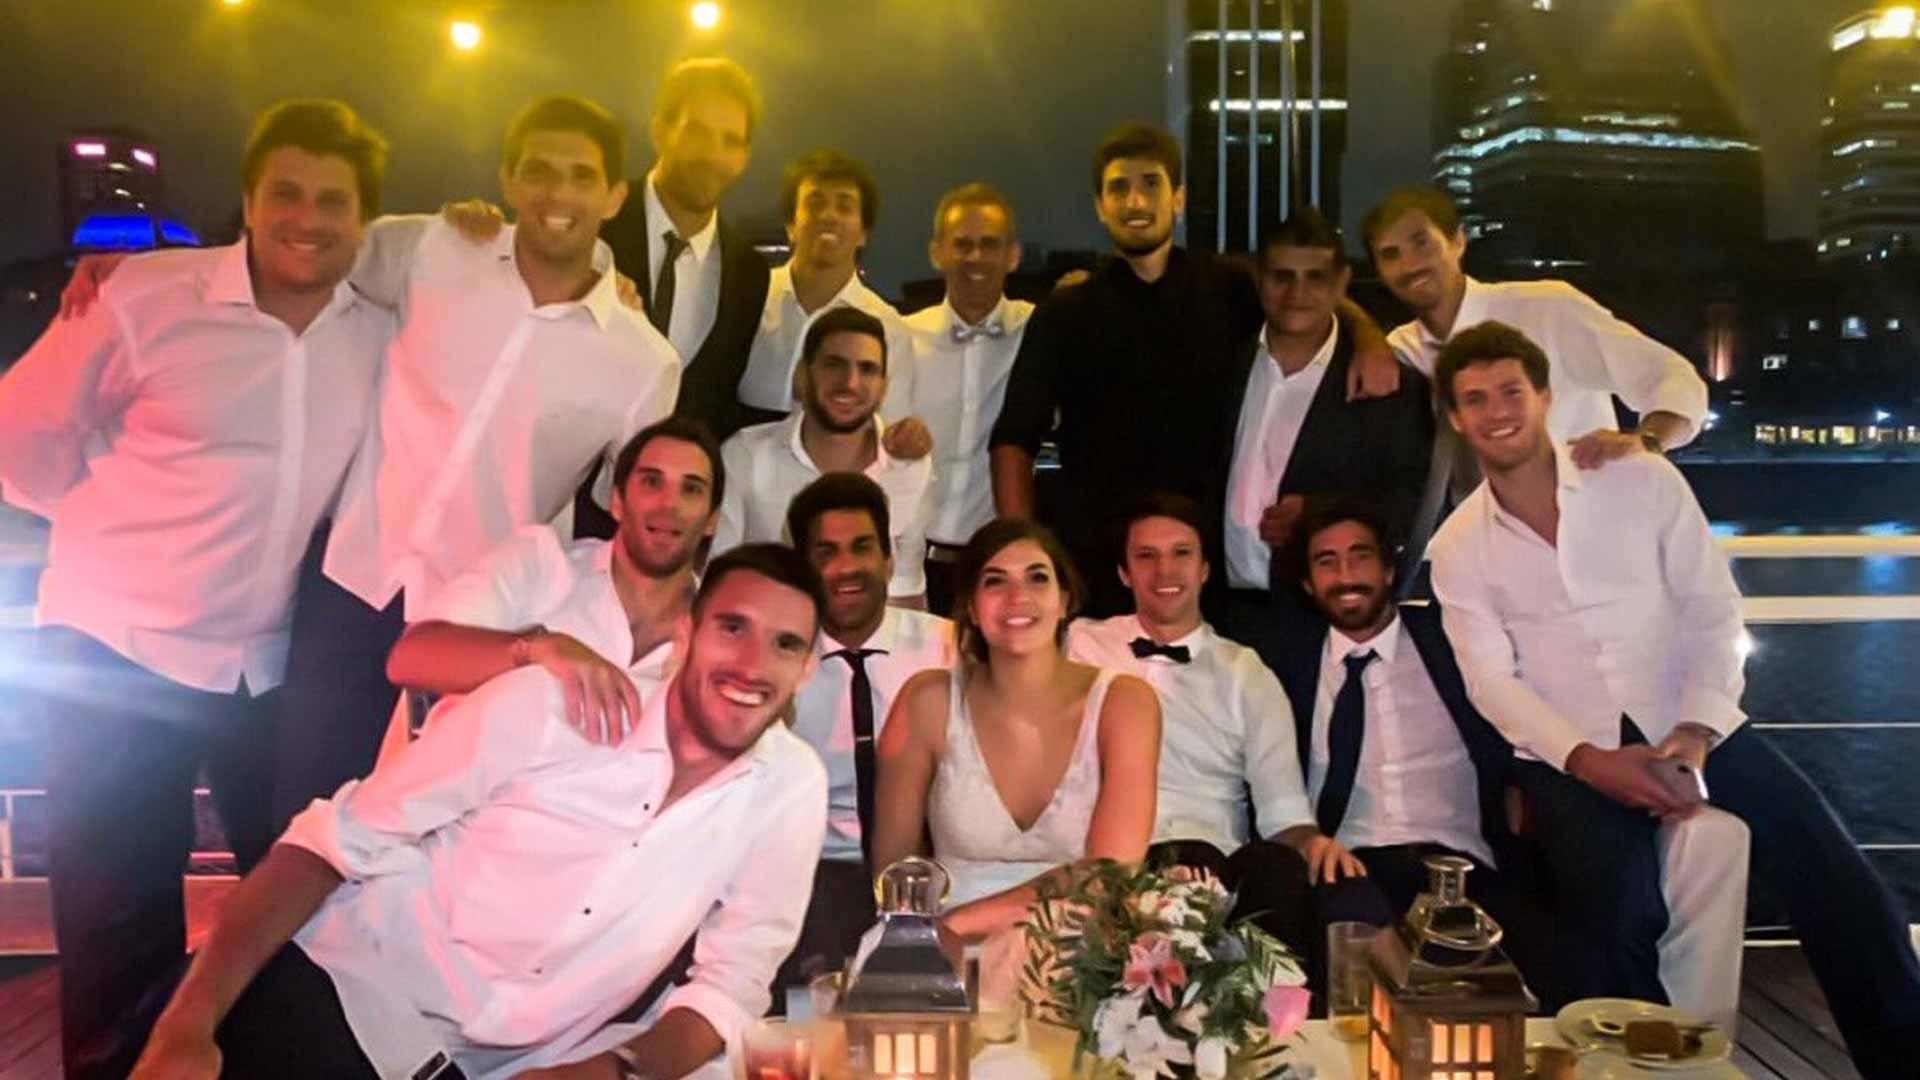 Leonardo Mayer wedding party